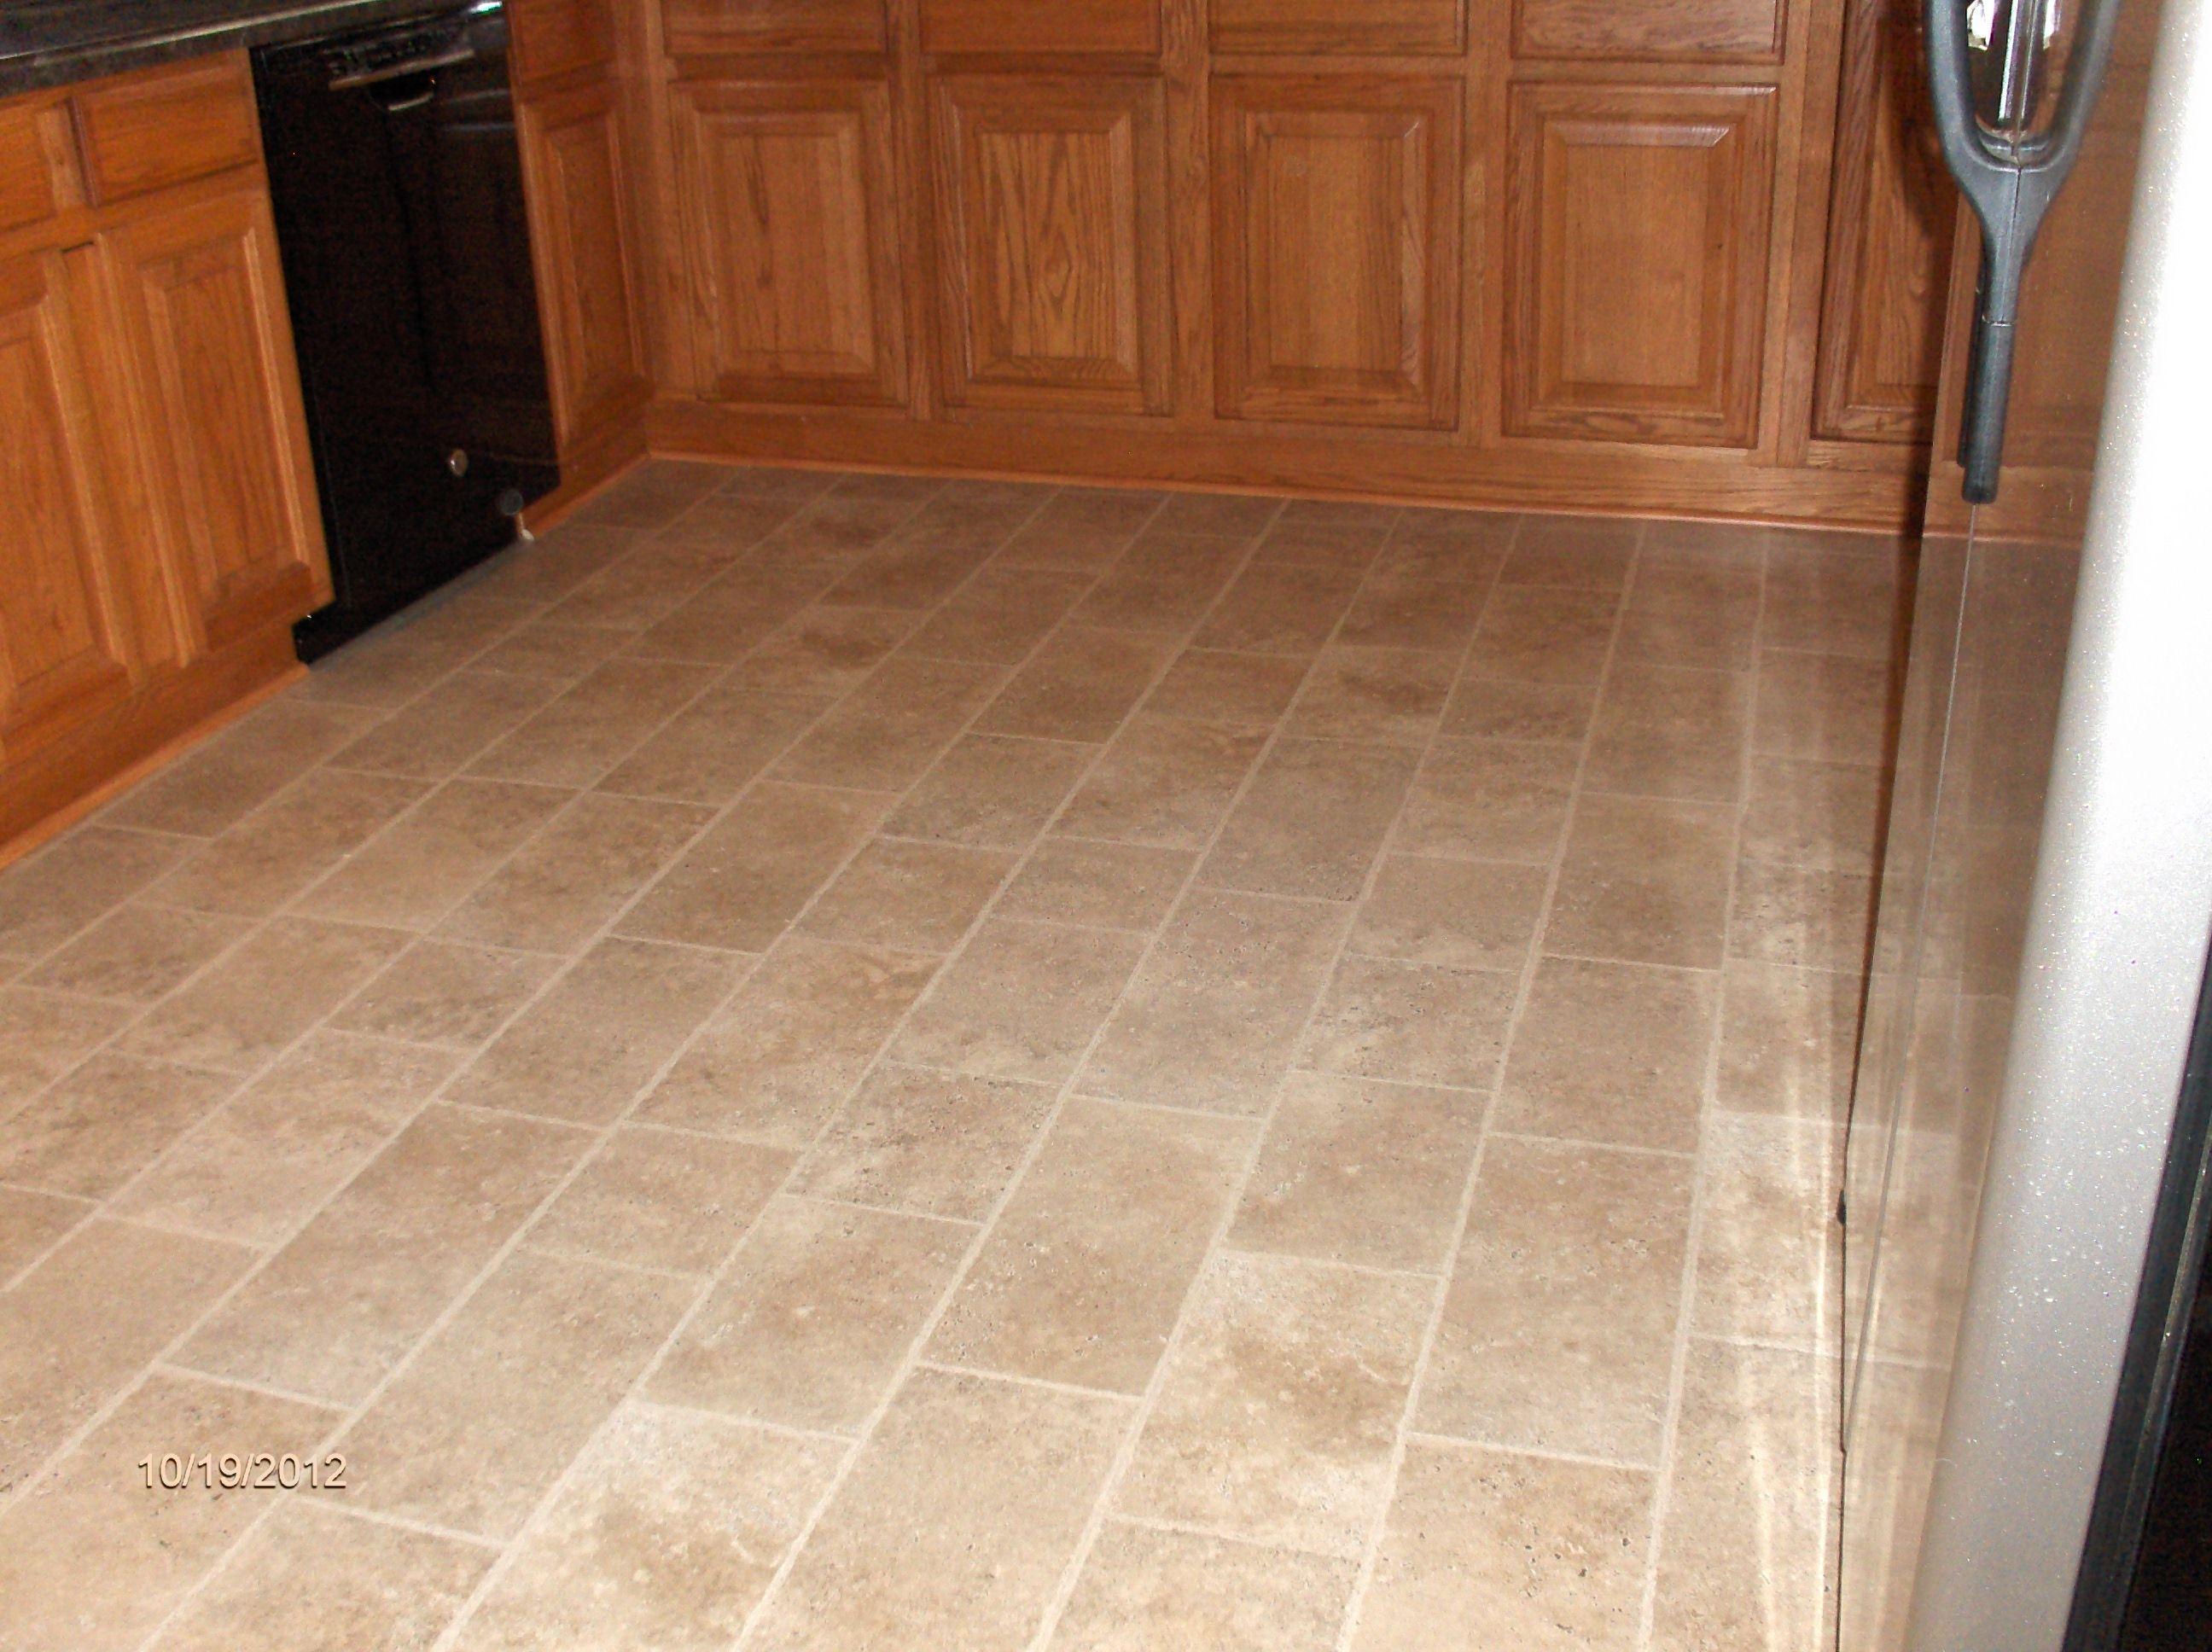 top 28 pergo flooring that looks like tile pergo flooring that looks like tile 28 images. Black Bedroom Furniture Sets. Home Design Ideas